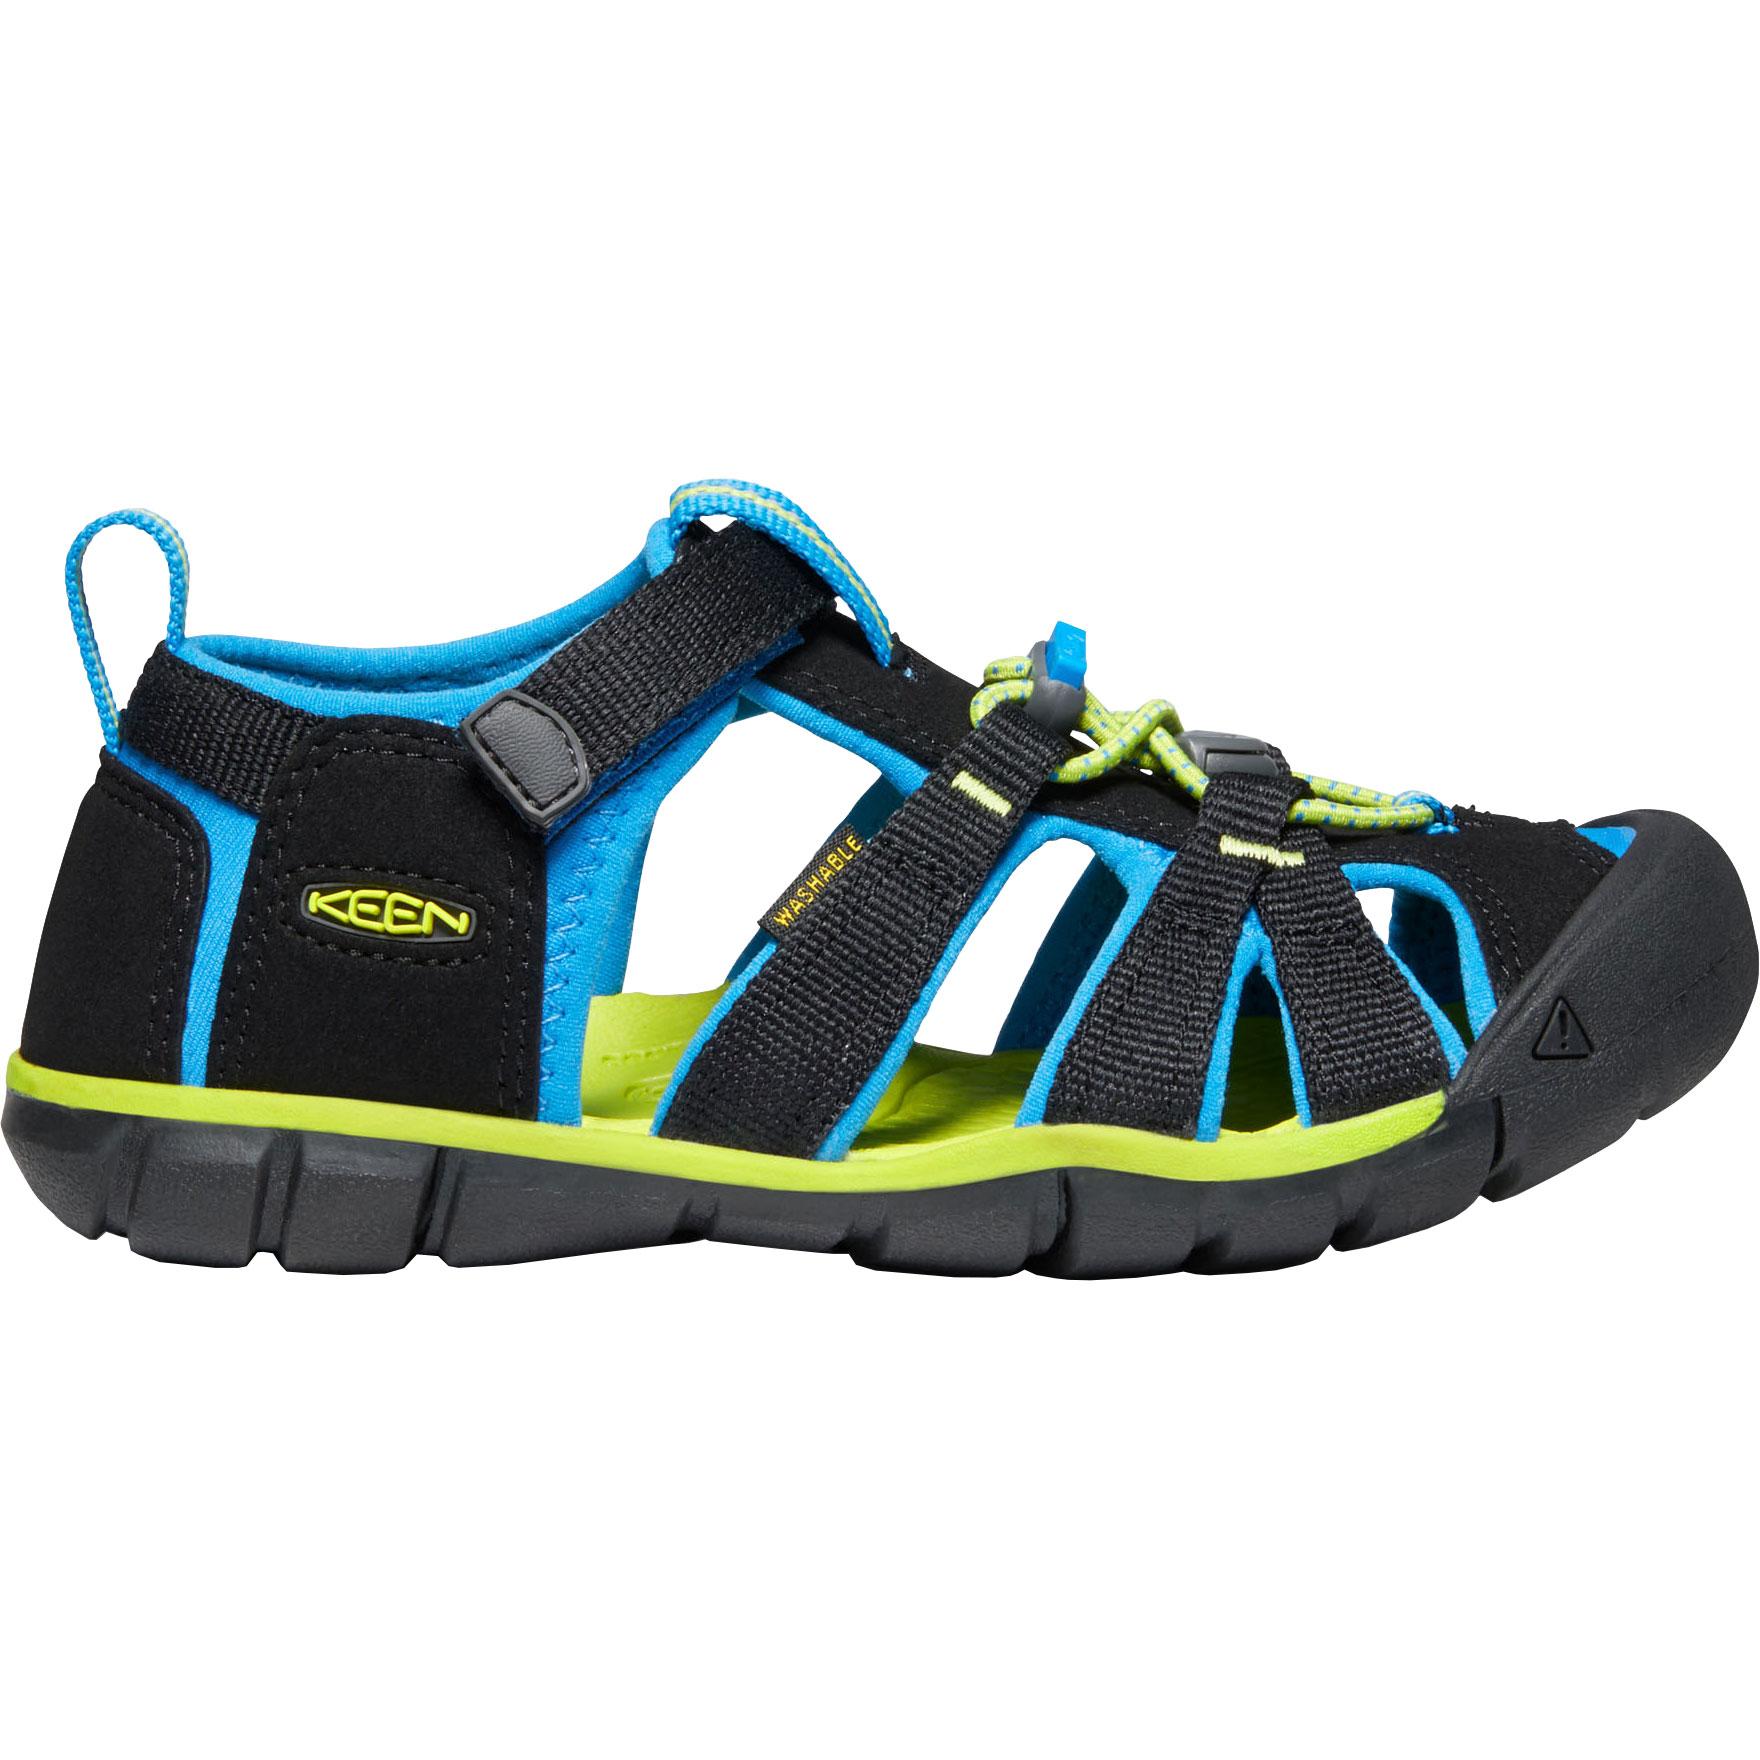 KEEN Seacamp II CNX Kinder-Sandale - Black / Brilliant Blue